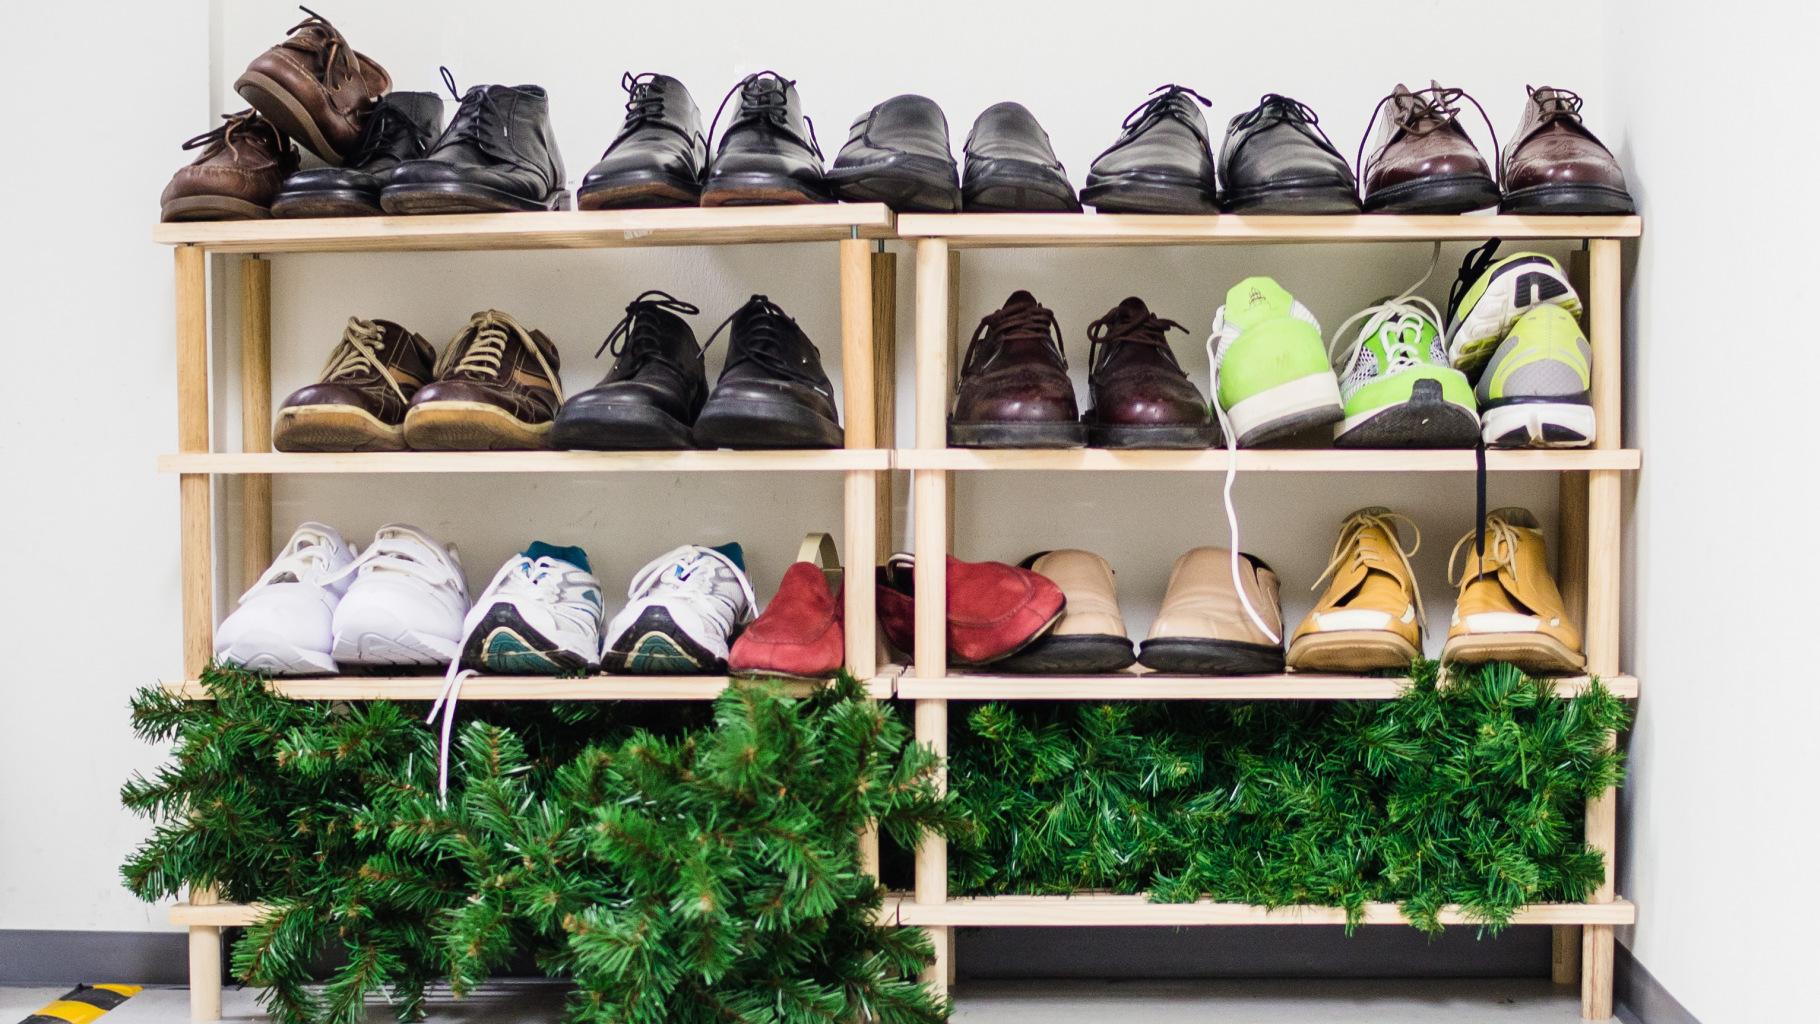 Schuhe aus dem Oxfam Shop im Regal